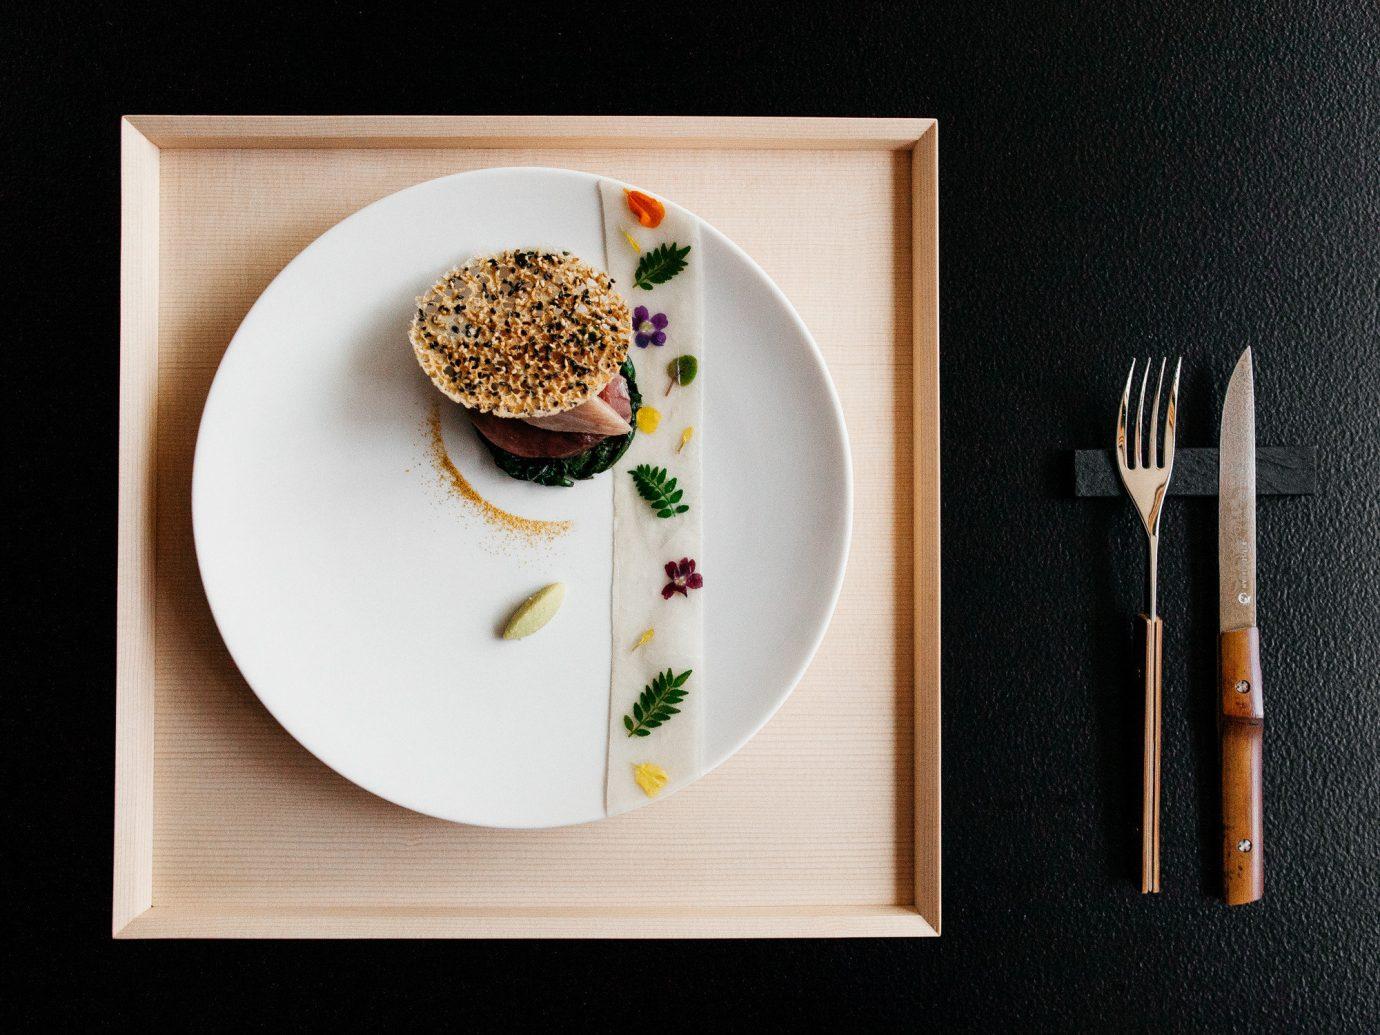 Hotels Japan Tokyo plate indoor cup food coffee cup meal produce dishware Drink